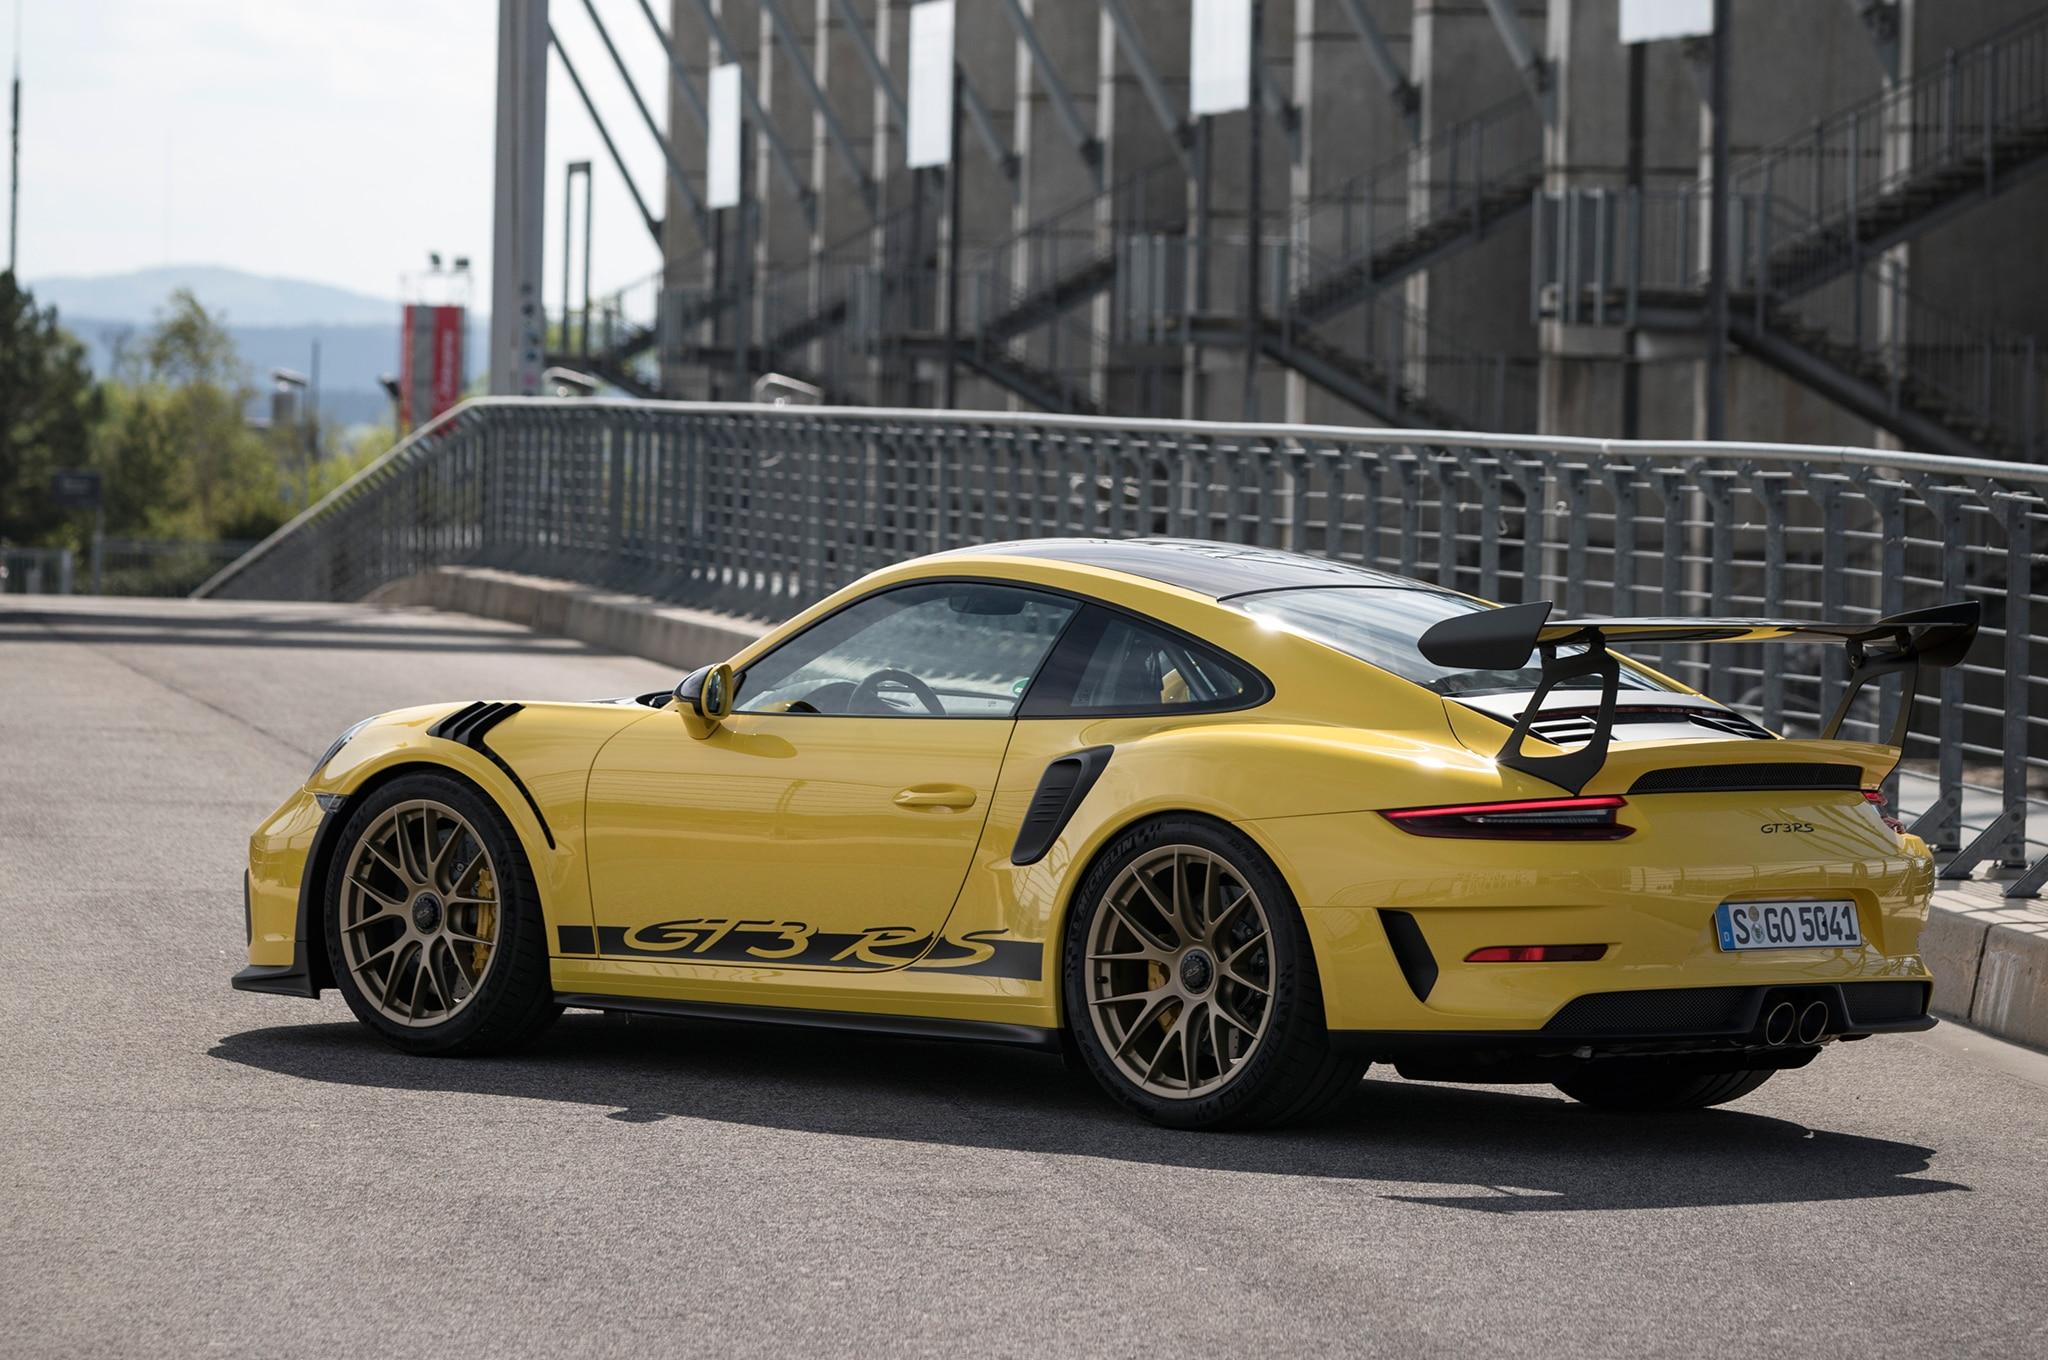 First Drive: 2019 Porsche 911 GT3 RS | Automobile Magazine